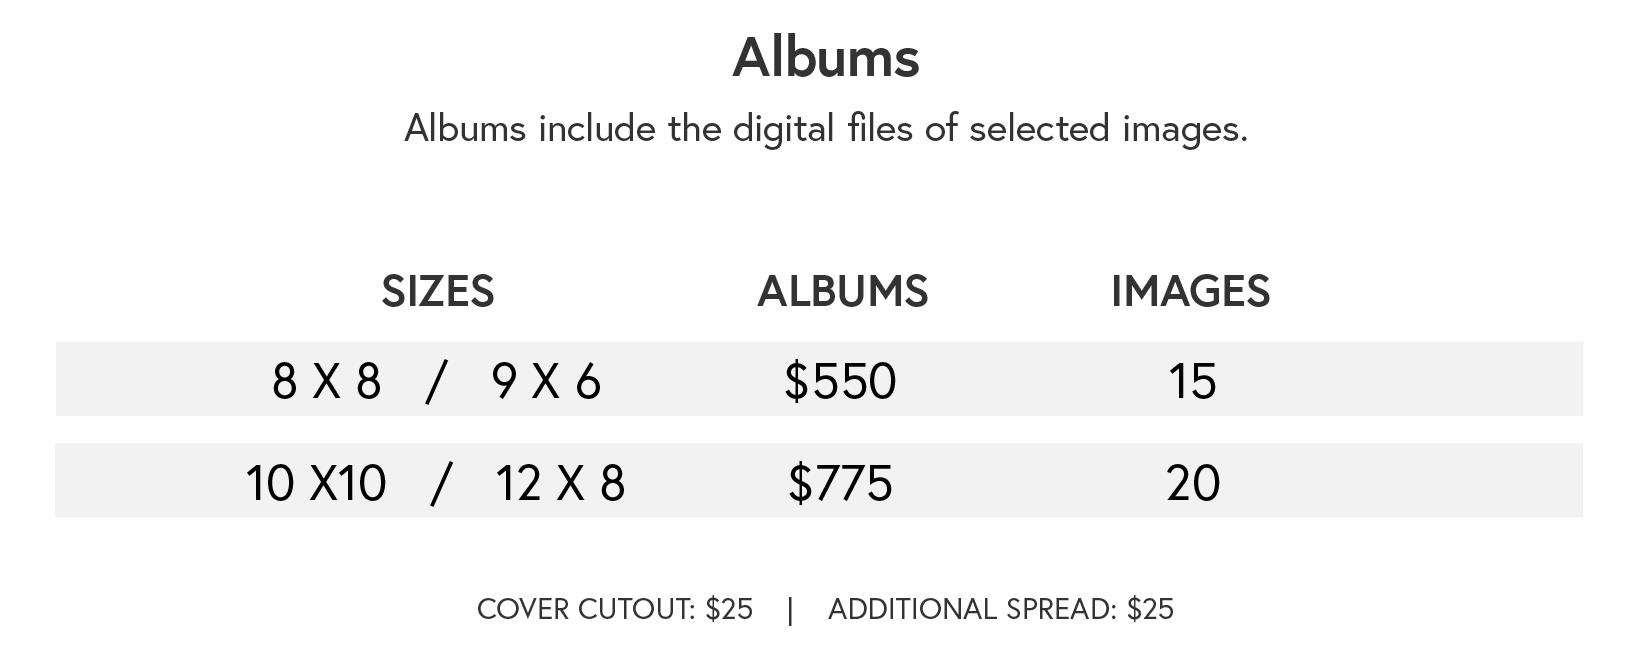 PricingGuide_Albums.png